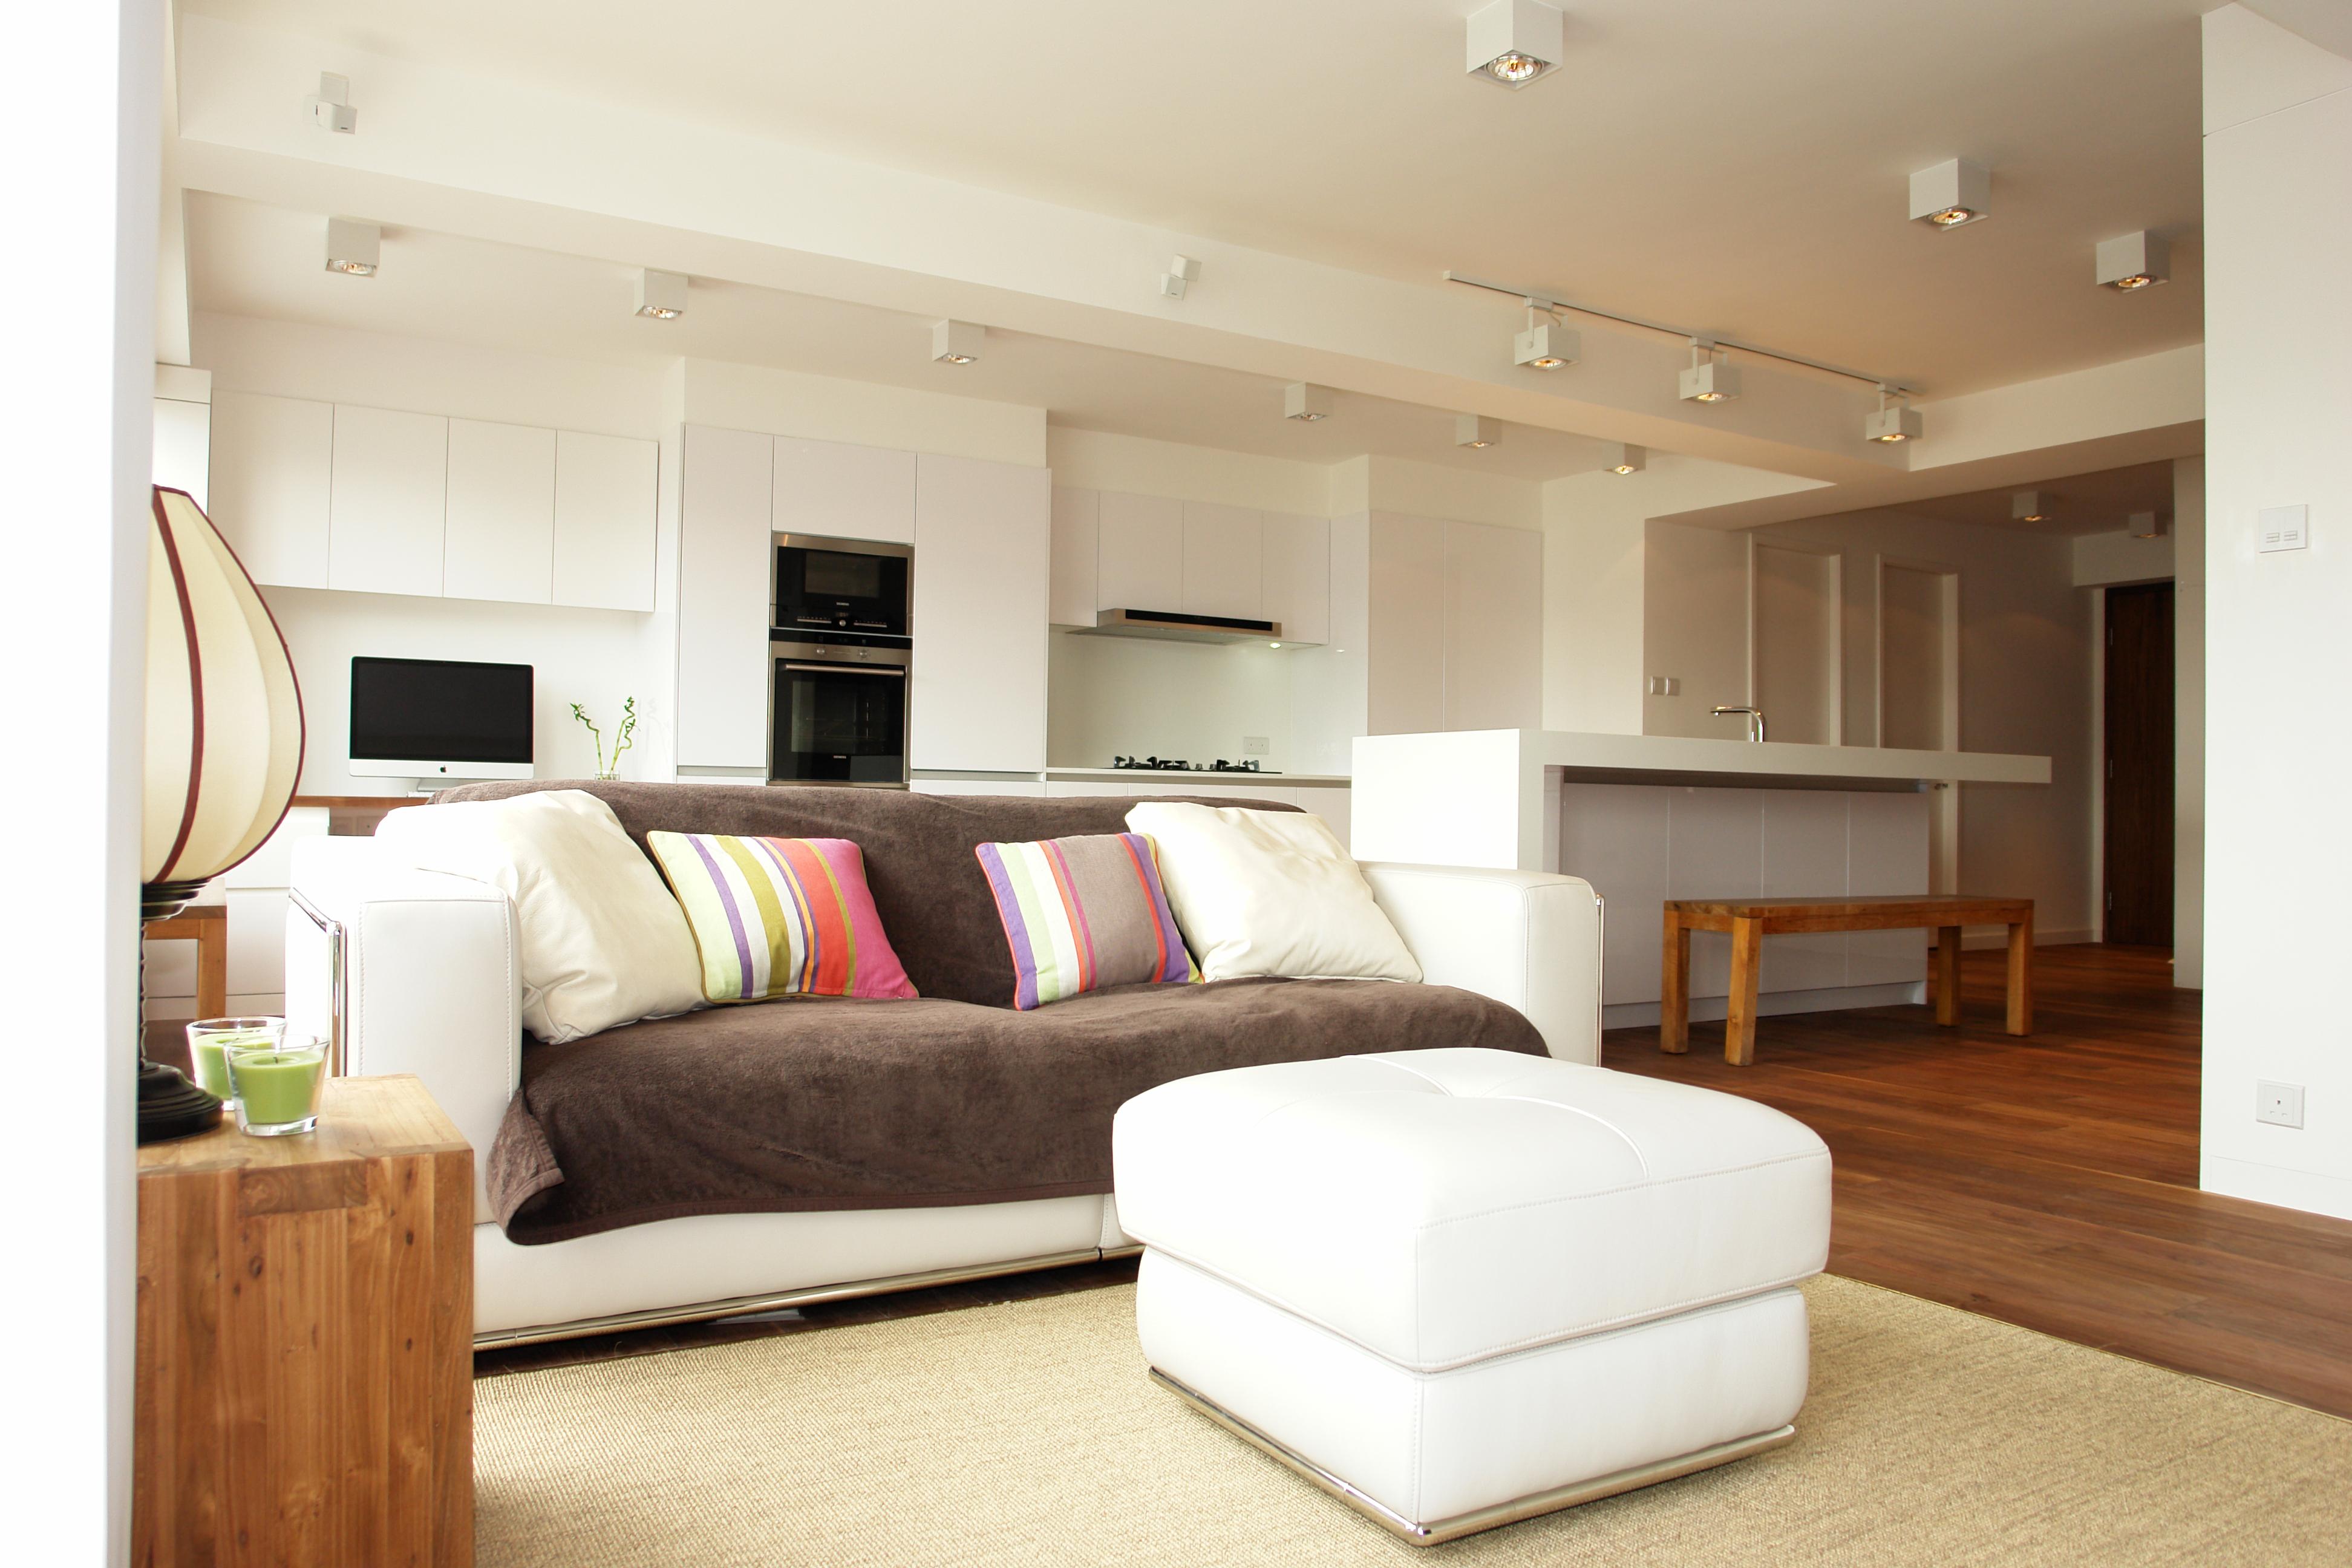 家居設計 Home Design hk 甜美的澳大利亞 Home Sweet Home Australia (9)